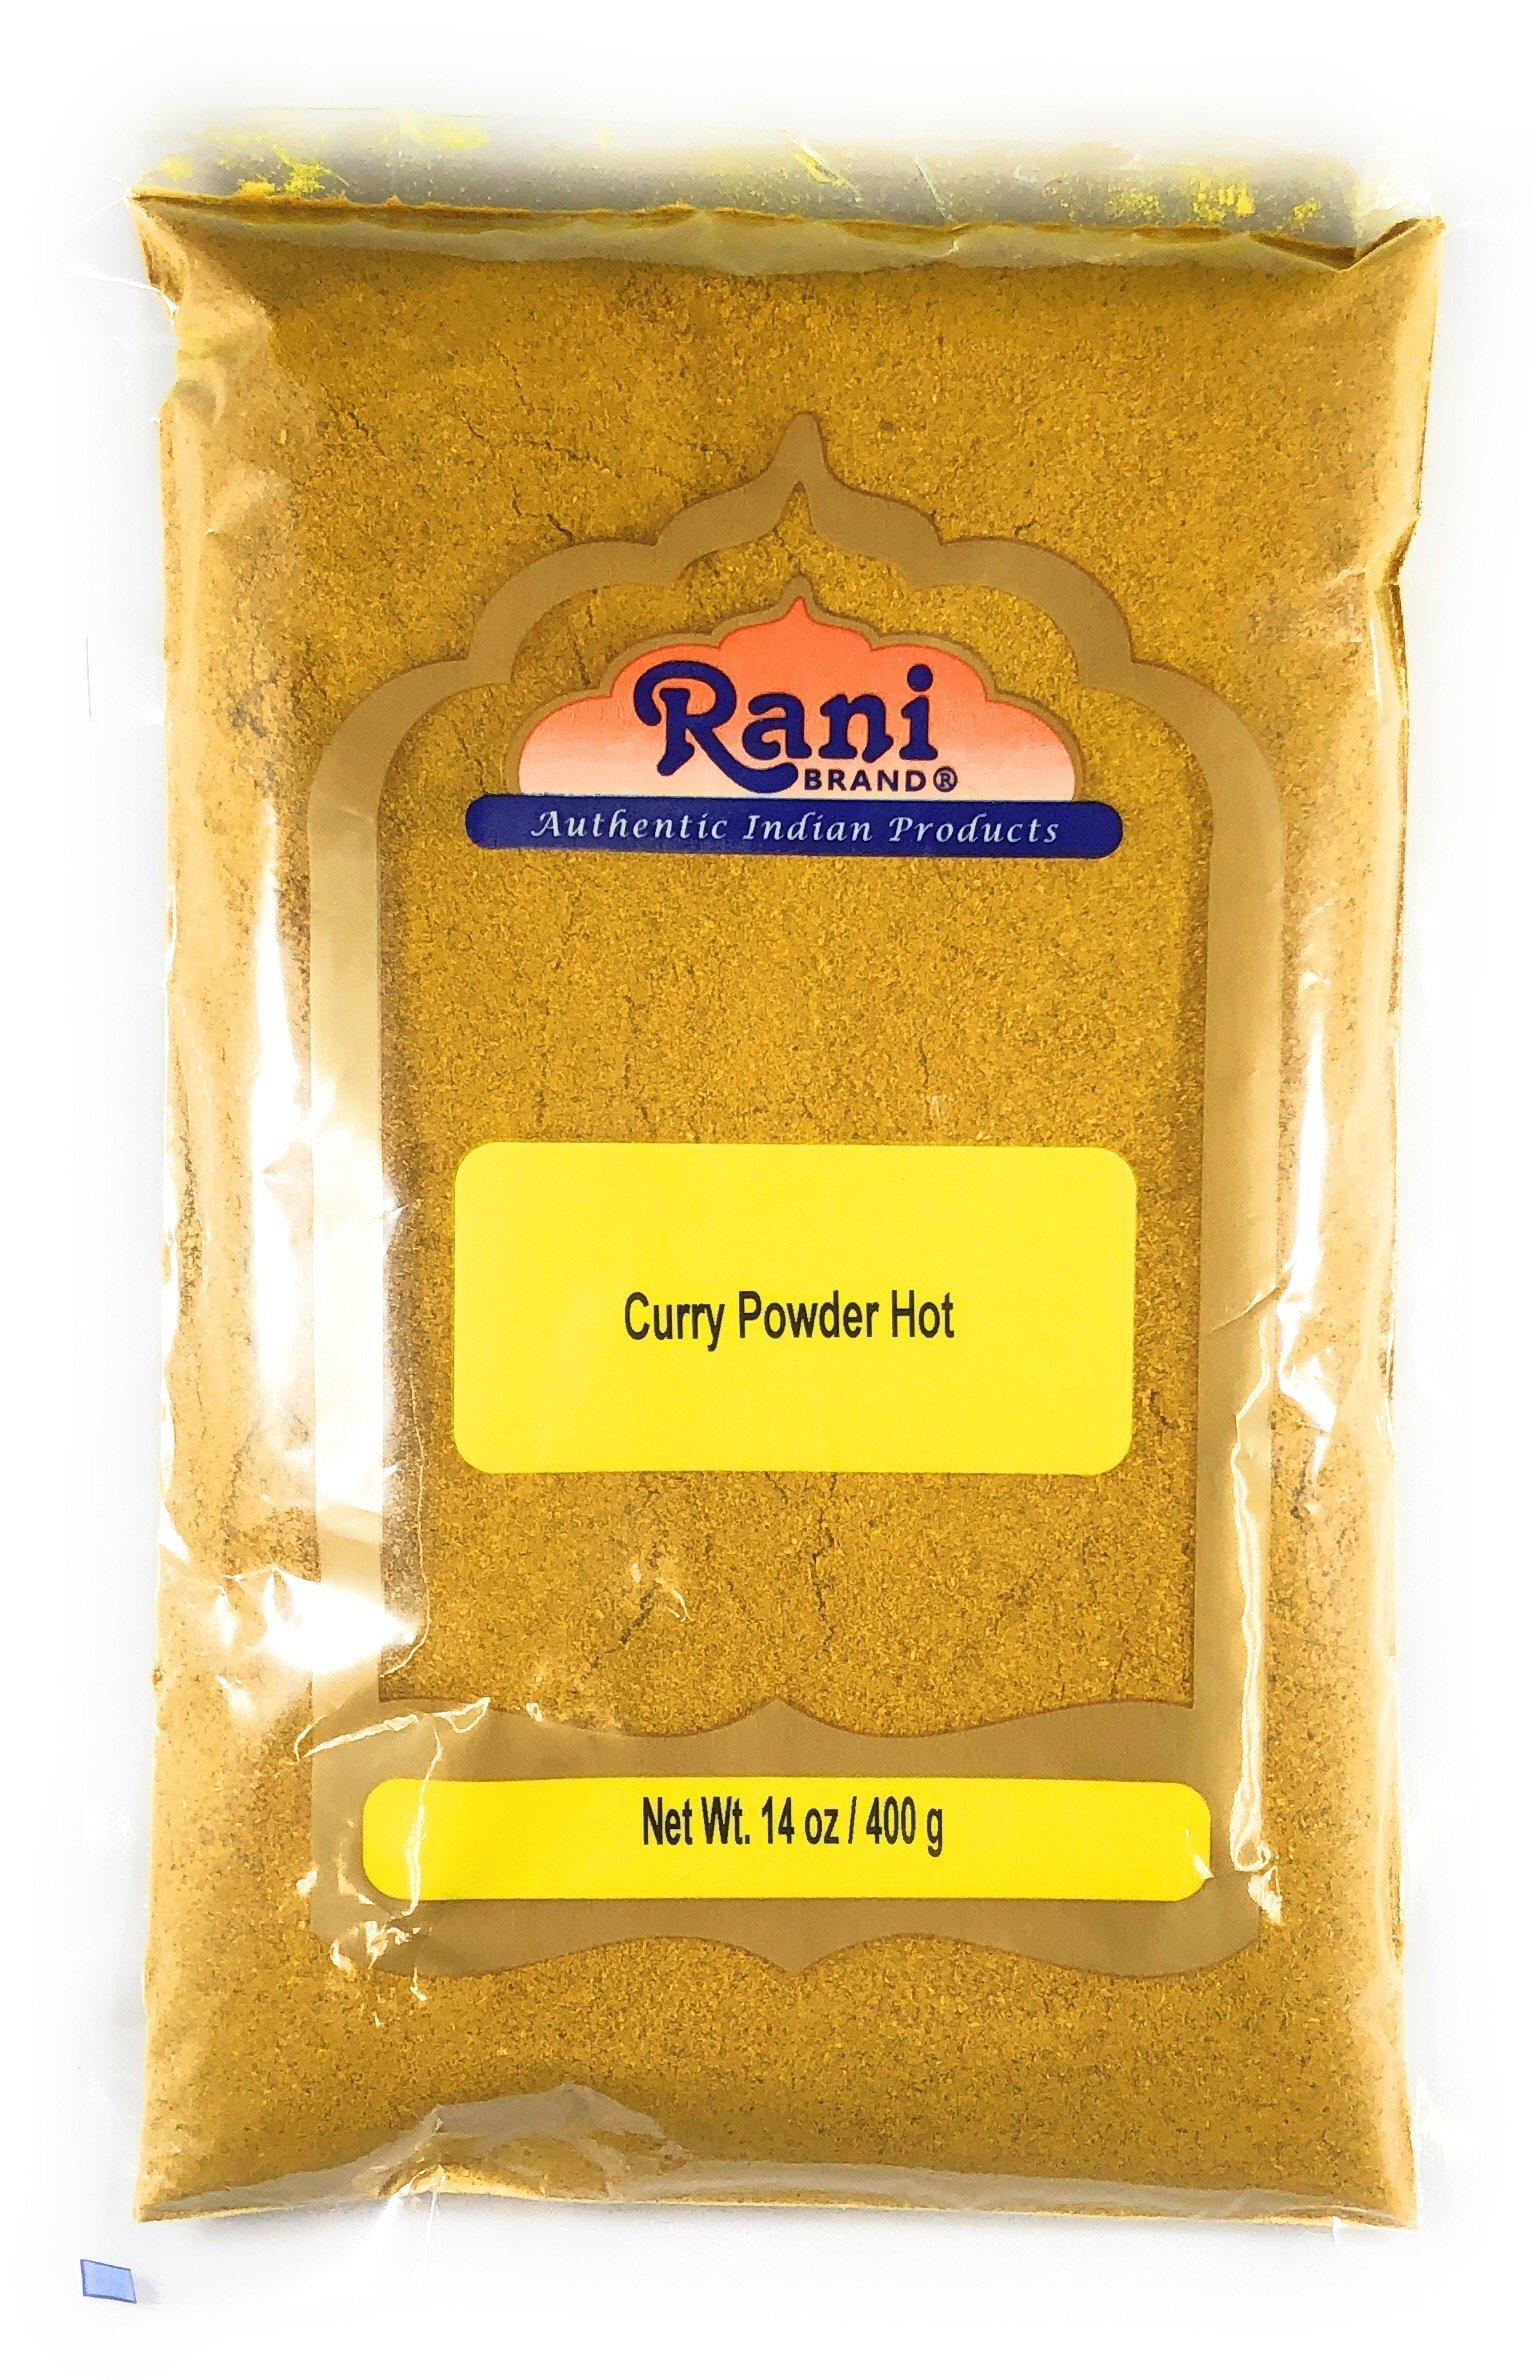 Rani Curry Powder Hot Natural Spice Blend 400g (14oz) Salt Free Gluten Free